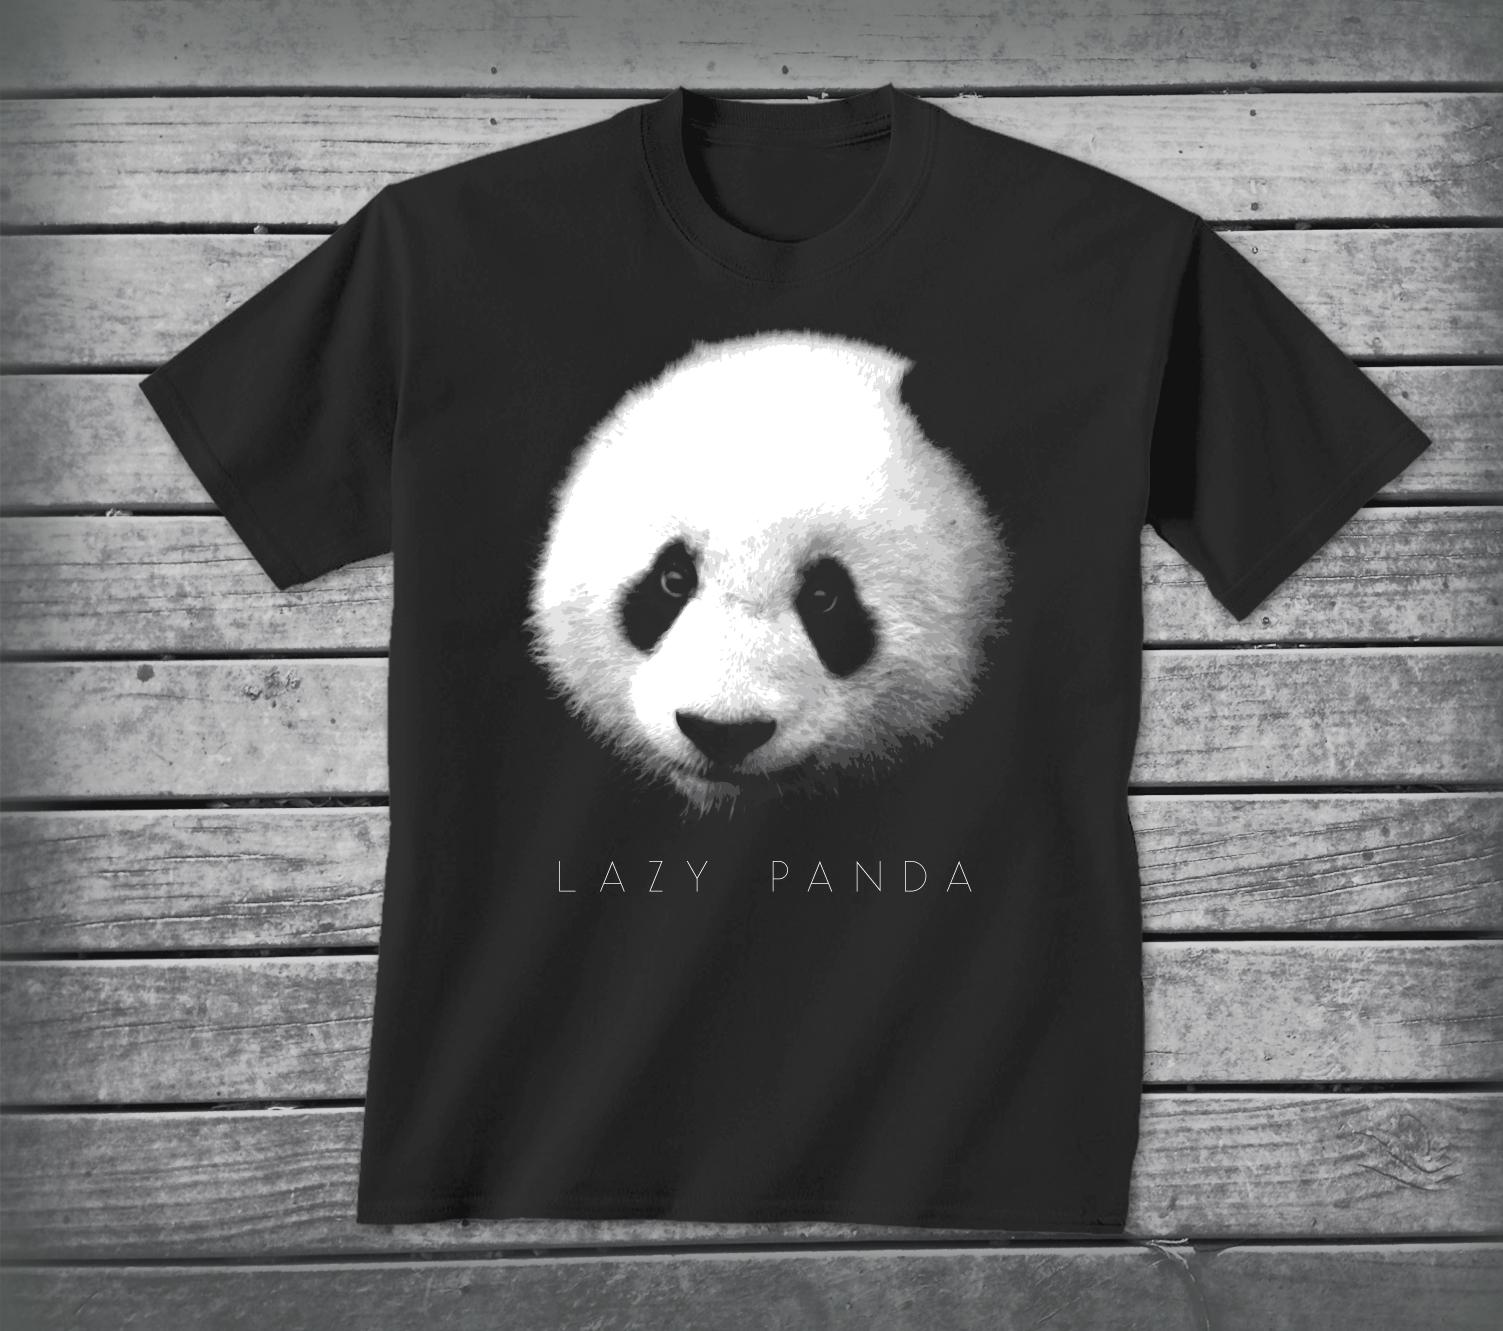 LazyPanda_TeeShirt.jpg